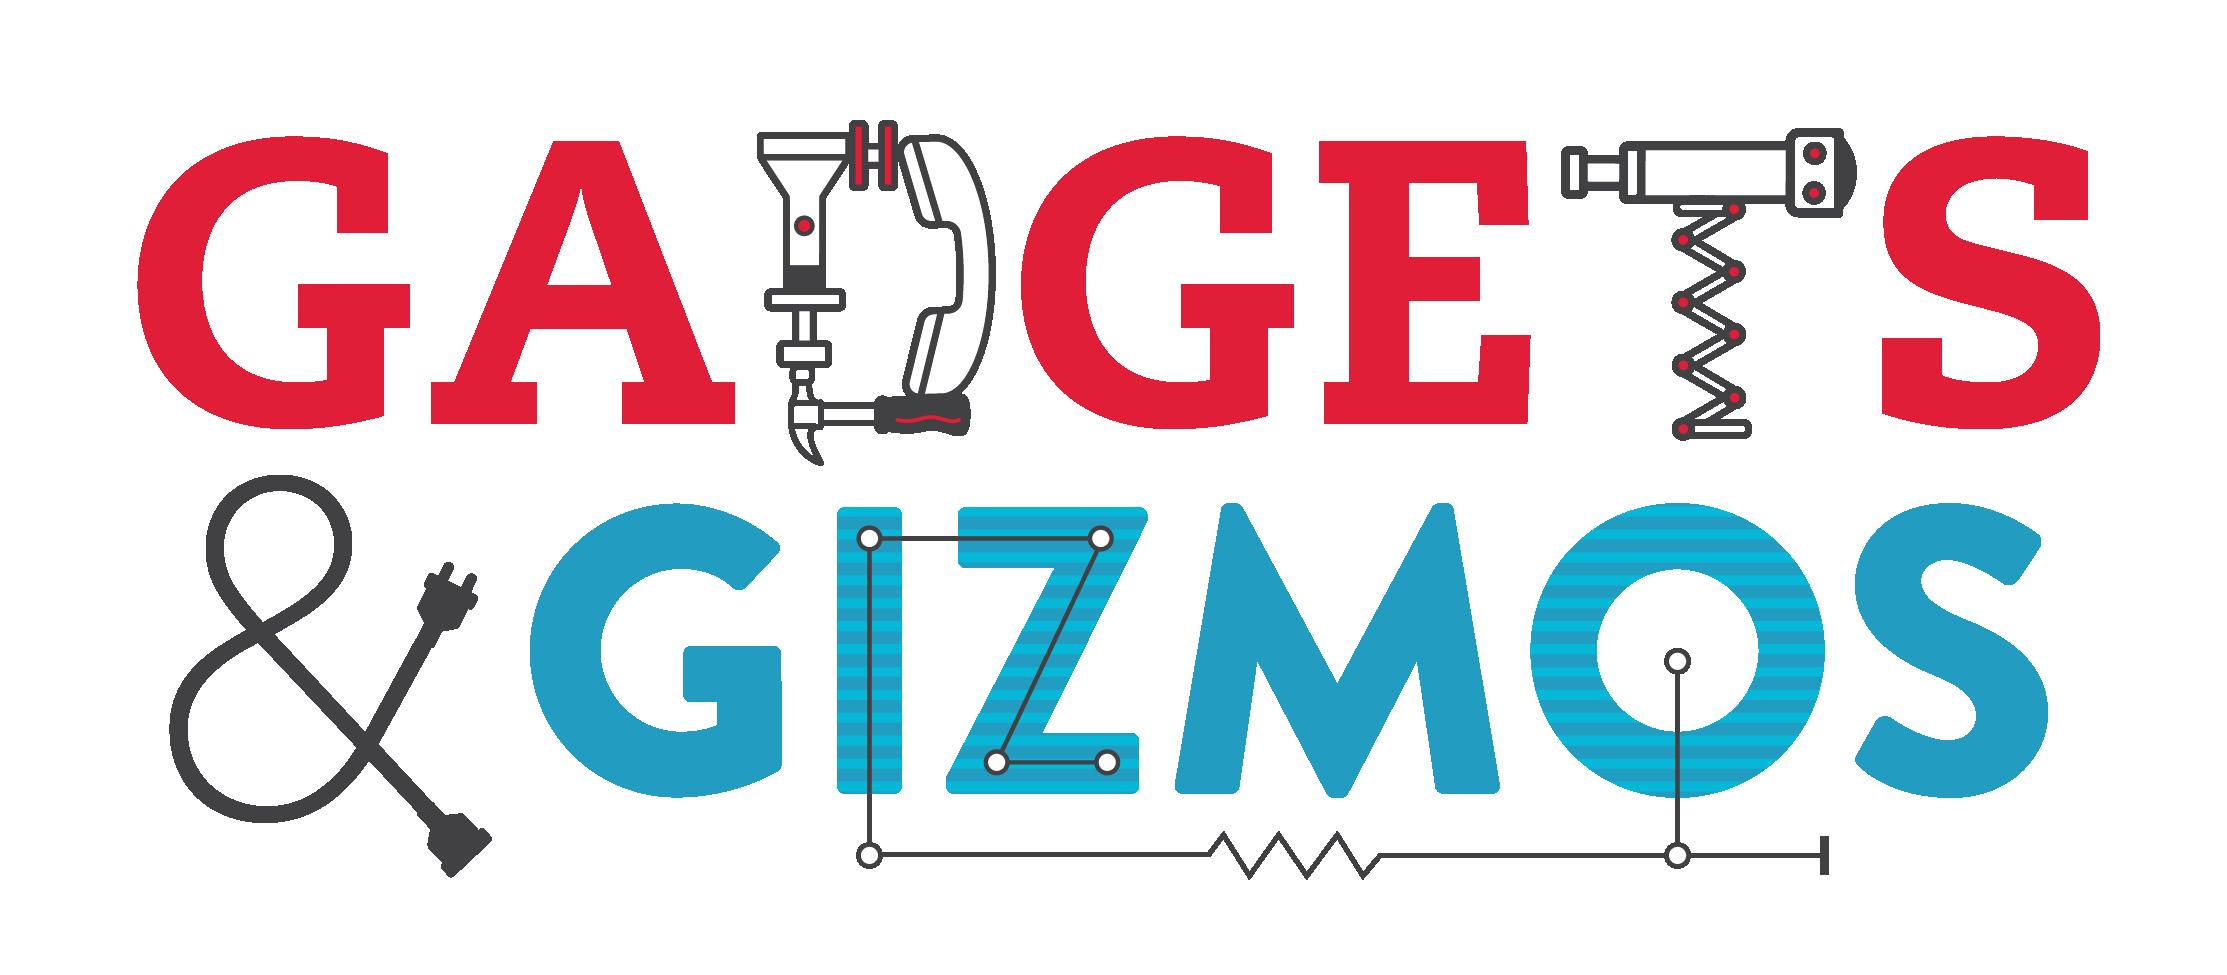 Gadget gizmo rgb